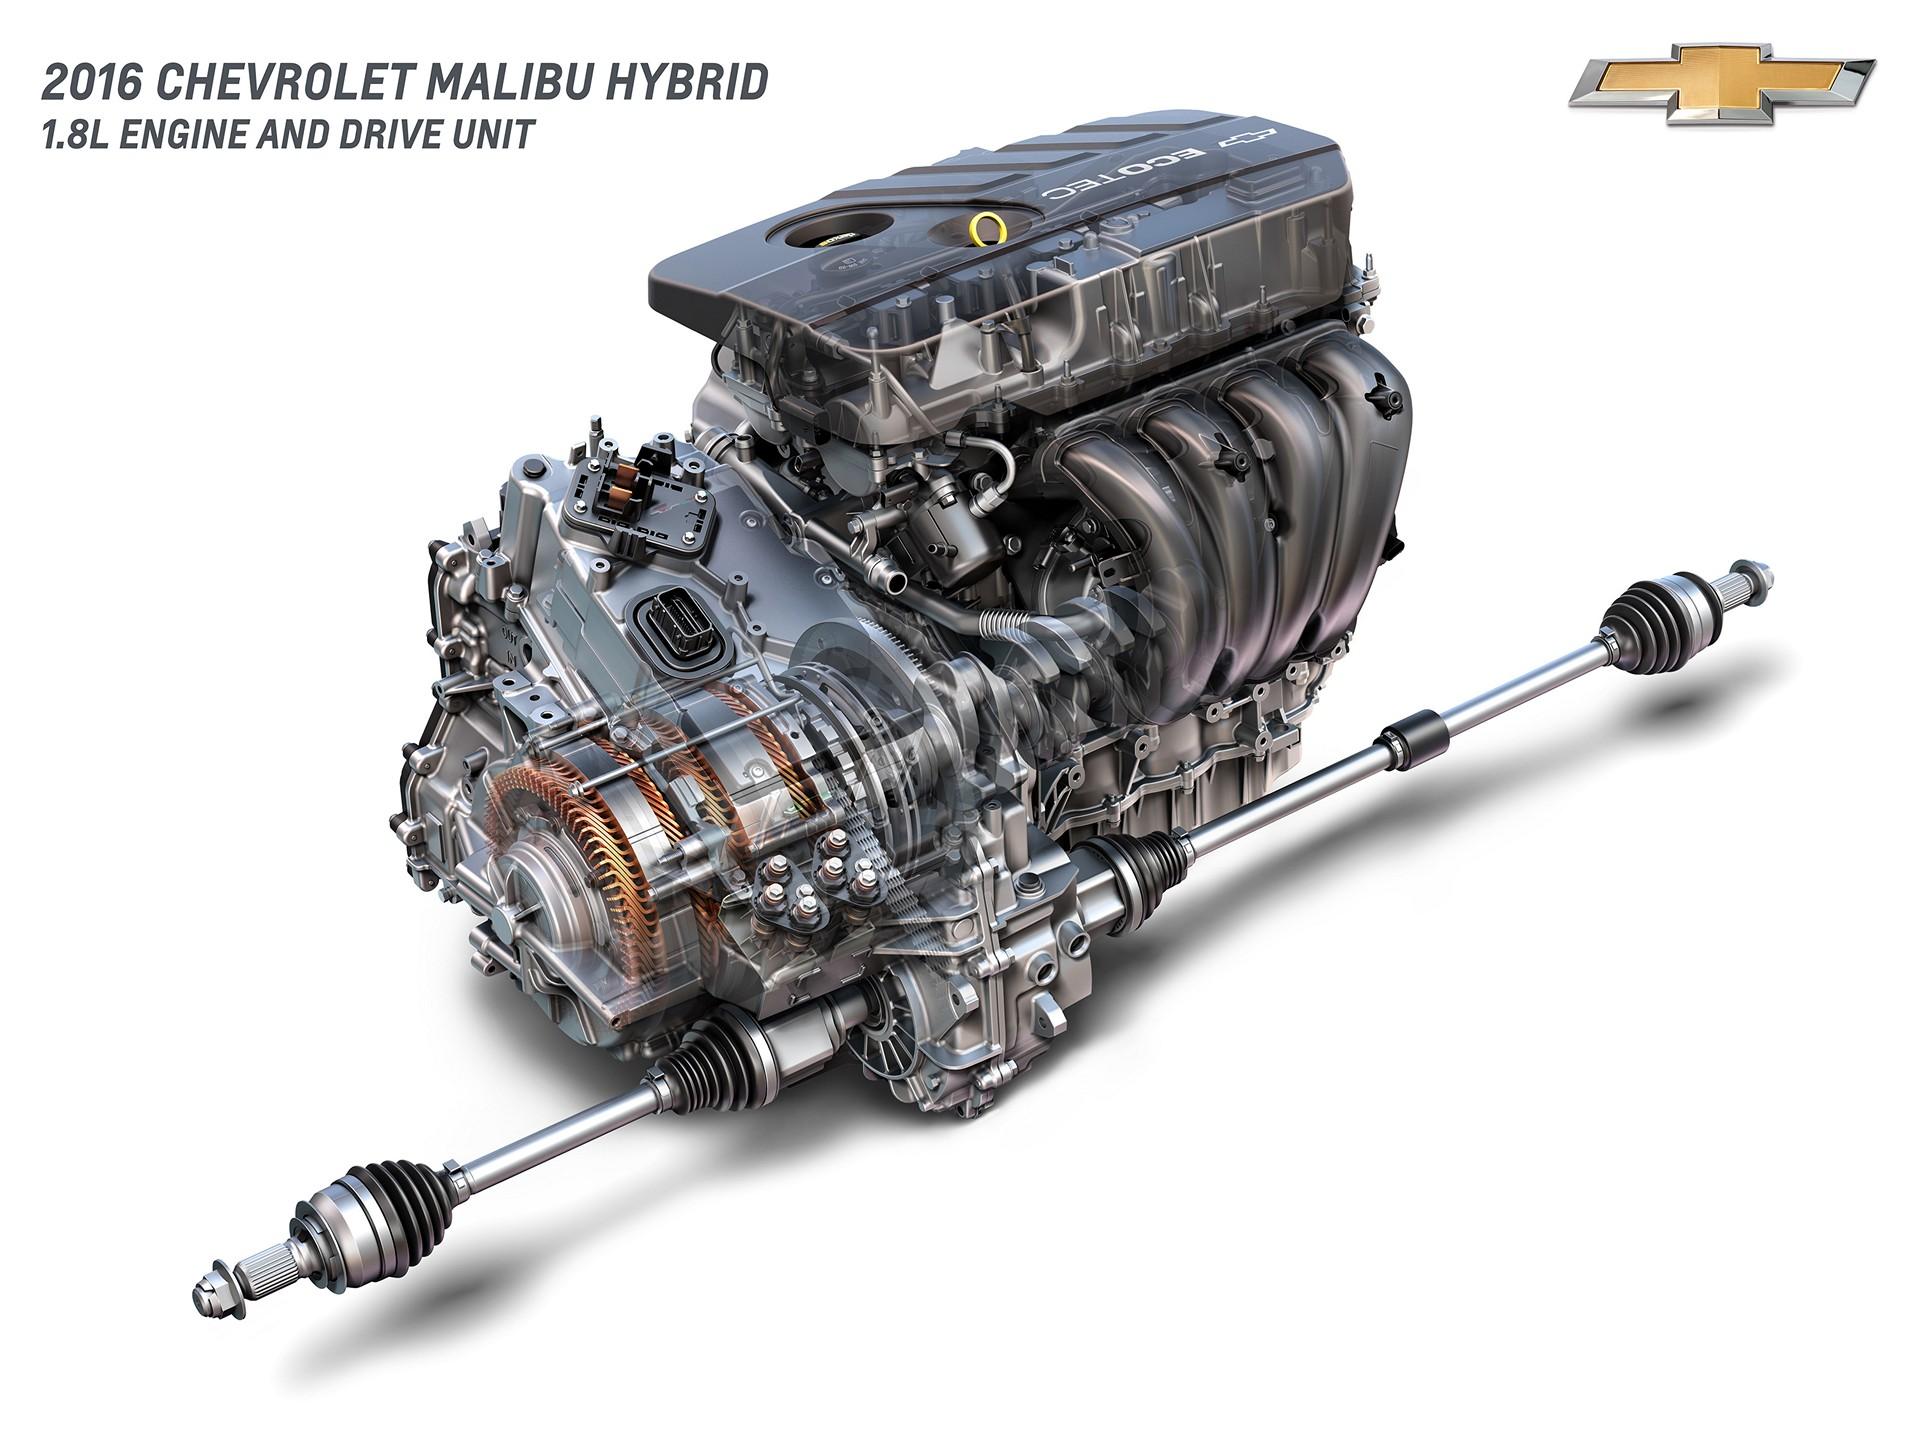 2016 Chevrolet Malibu Hybrid 1.8L Engine and Drive Unit © General Motors